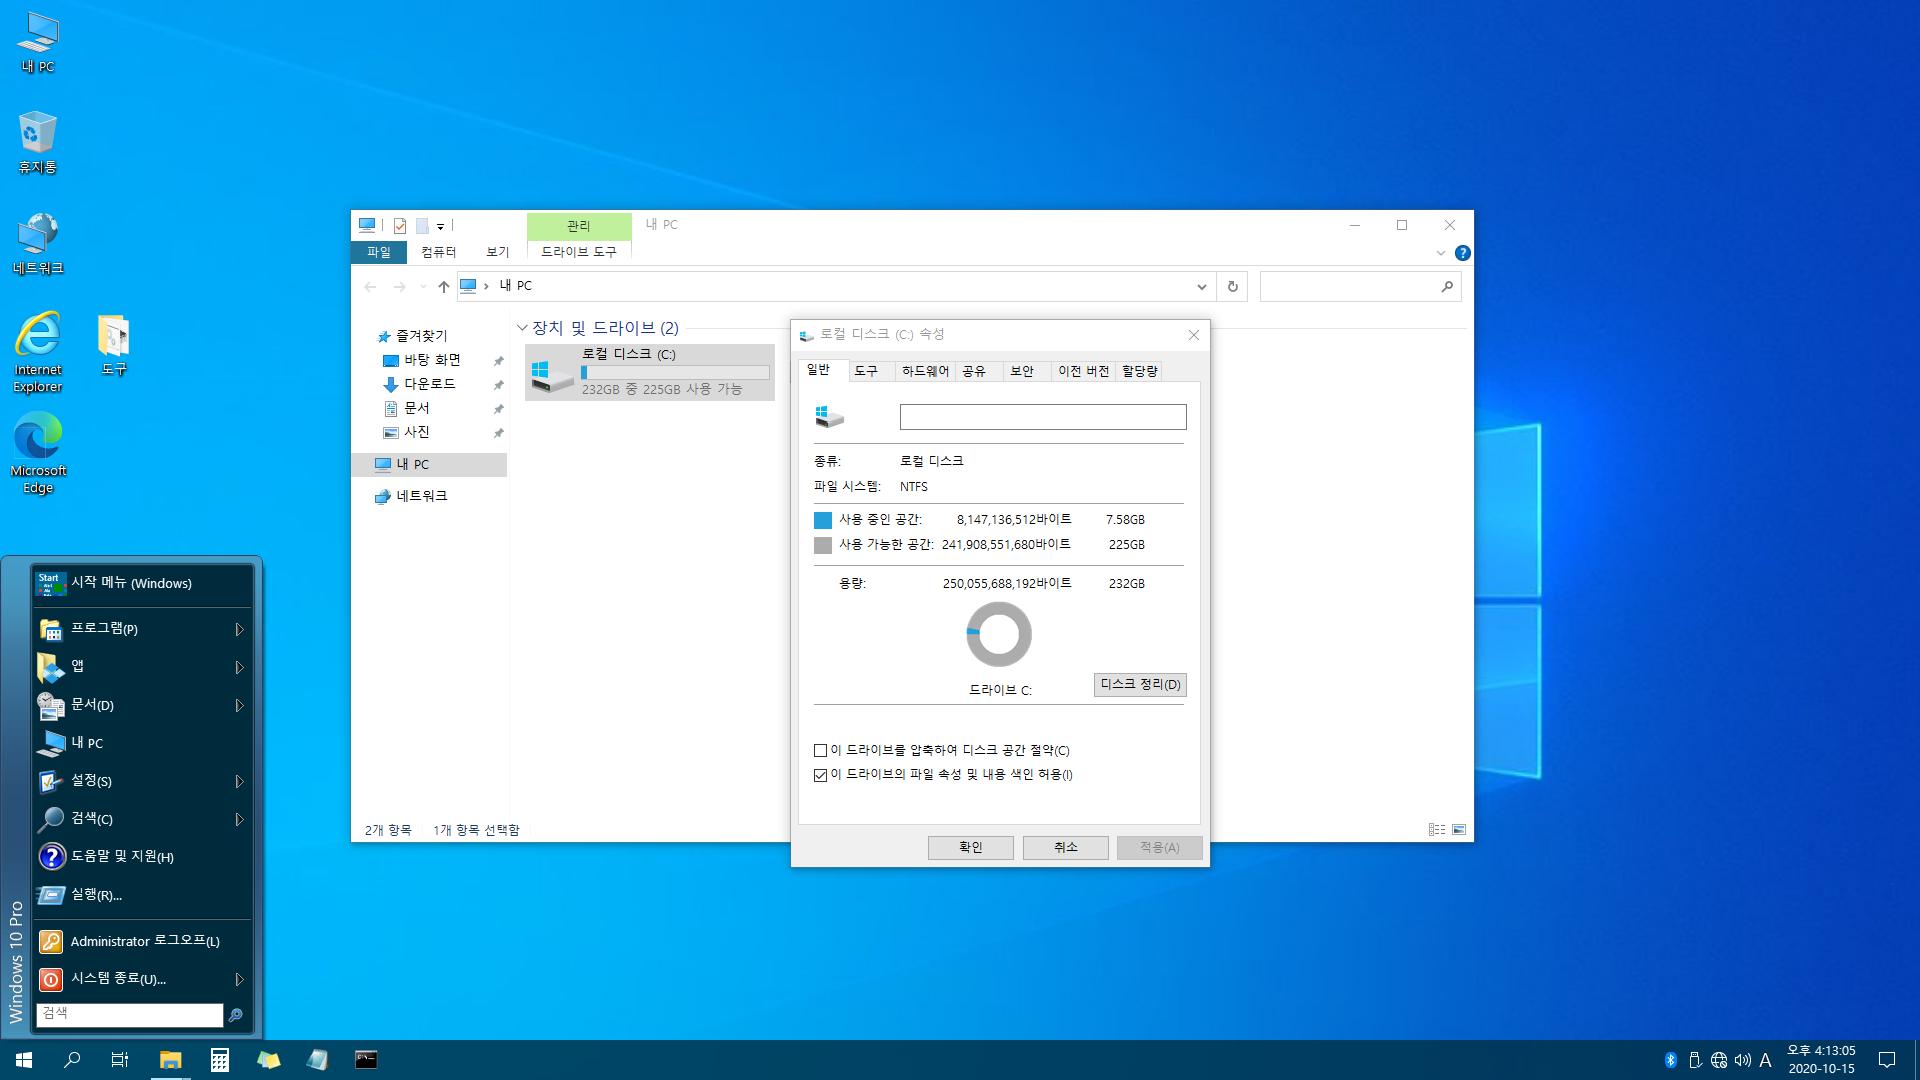 1. Win10 Pro 20H1 x64 19041_Admin.png